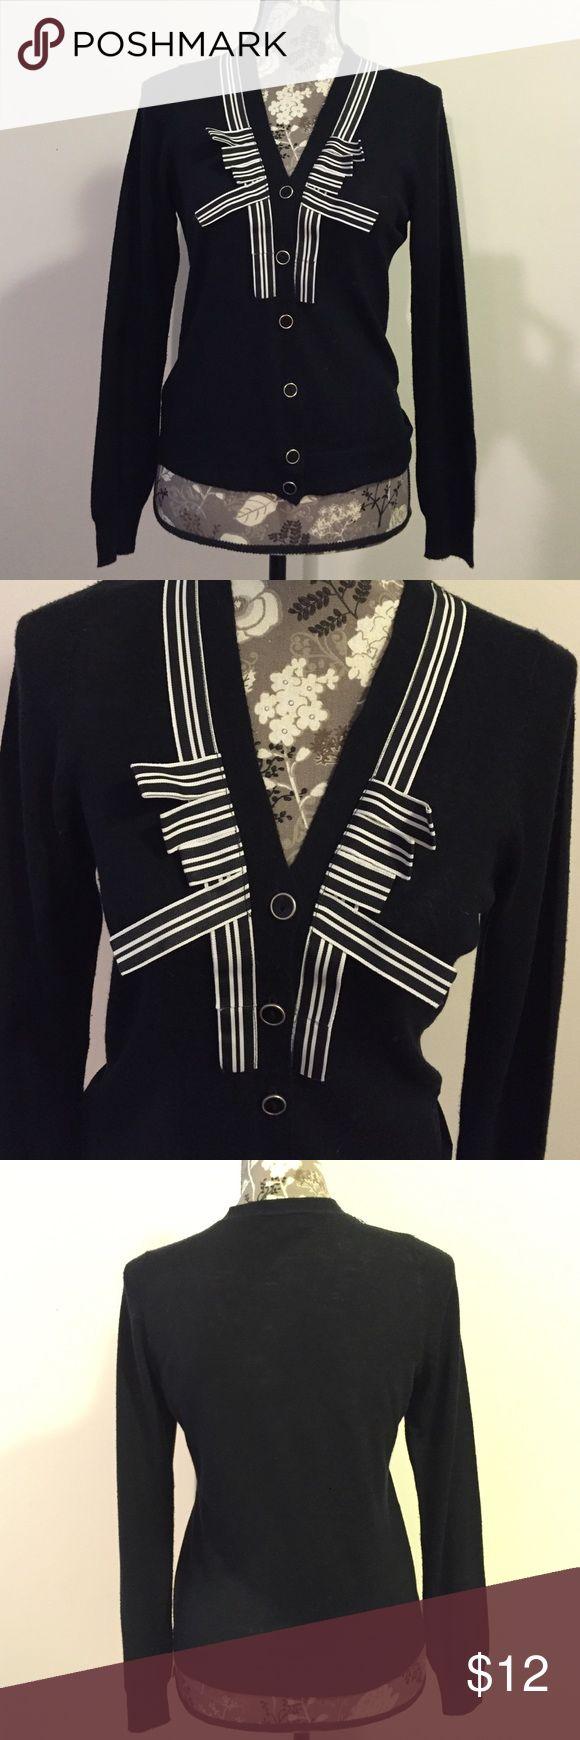 Spotted while shopping on Poshmark: Brooklyn industries nautical cardigan medium! #poshmark #fashion #shopping #style #Brooklyn Industries #Sweaters